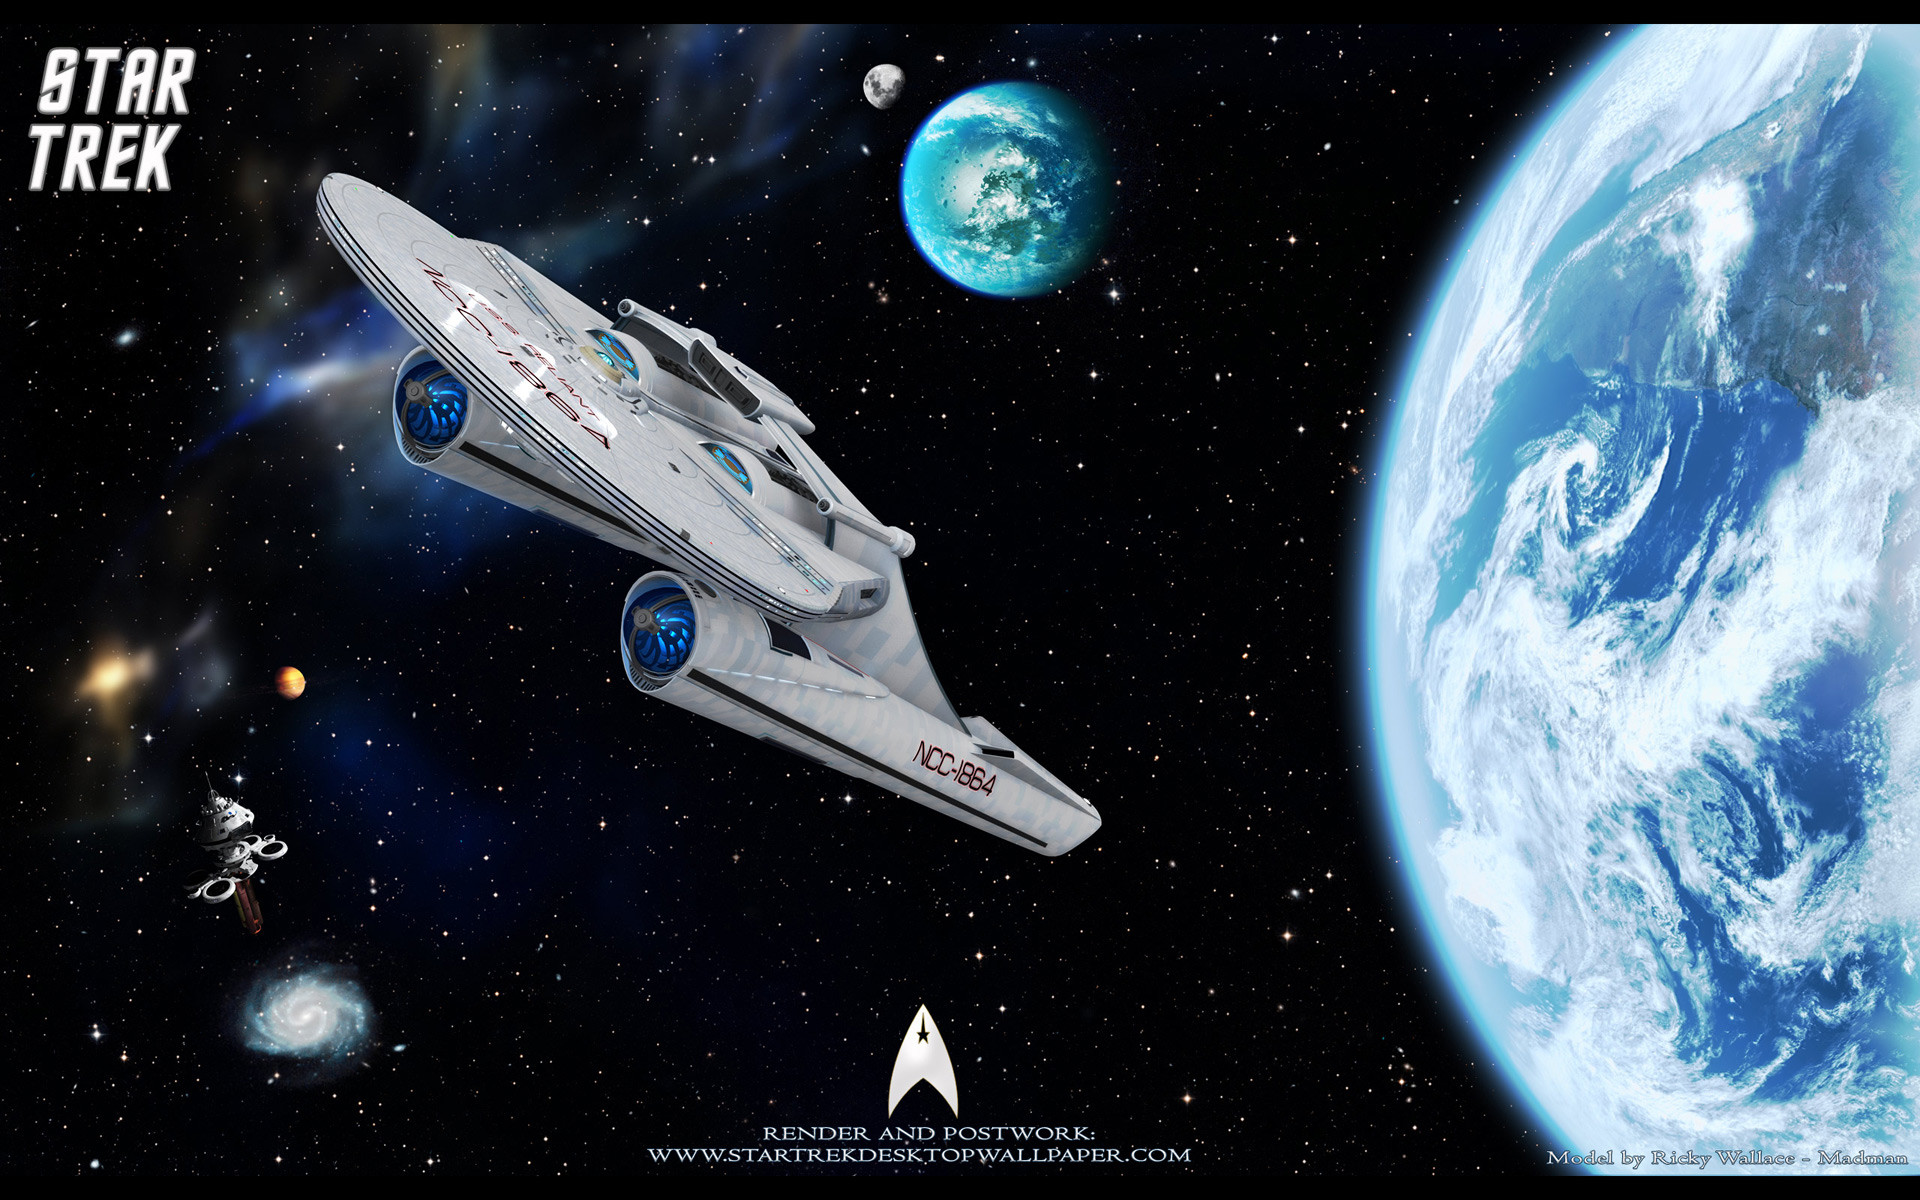 Screensavers For Samsung Galaxy S7: Star Trek Into Darkness Wallpaper (78+ Images